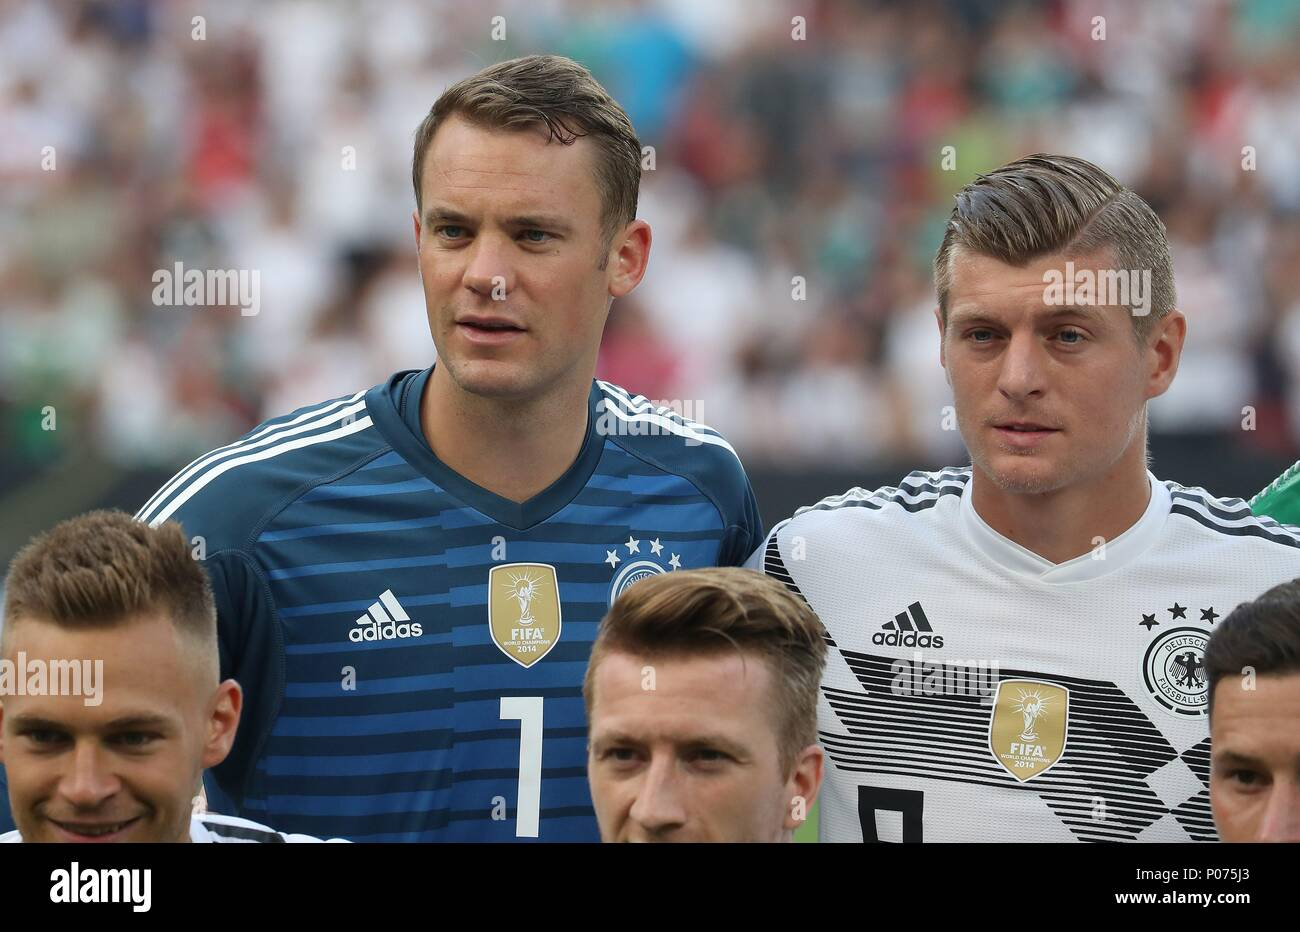 firo Football: Football: 08.06.2018 National Team Test match: Germany - Saudi Arabia 2: 1 Manuel Neuer, Portrait with Toni Kroos   - Stock Image